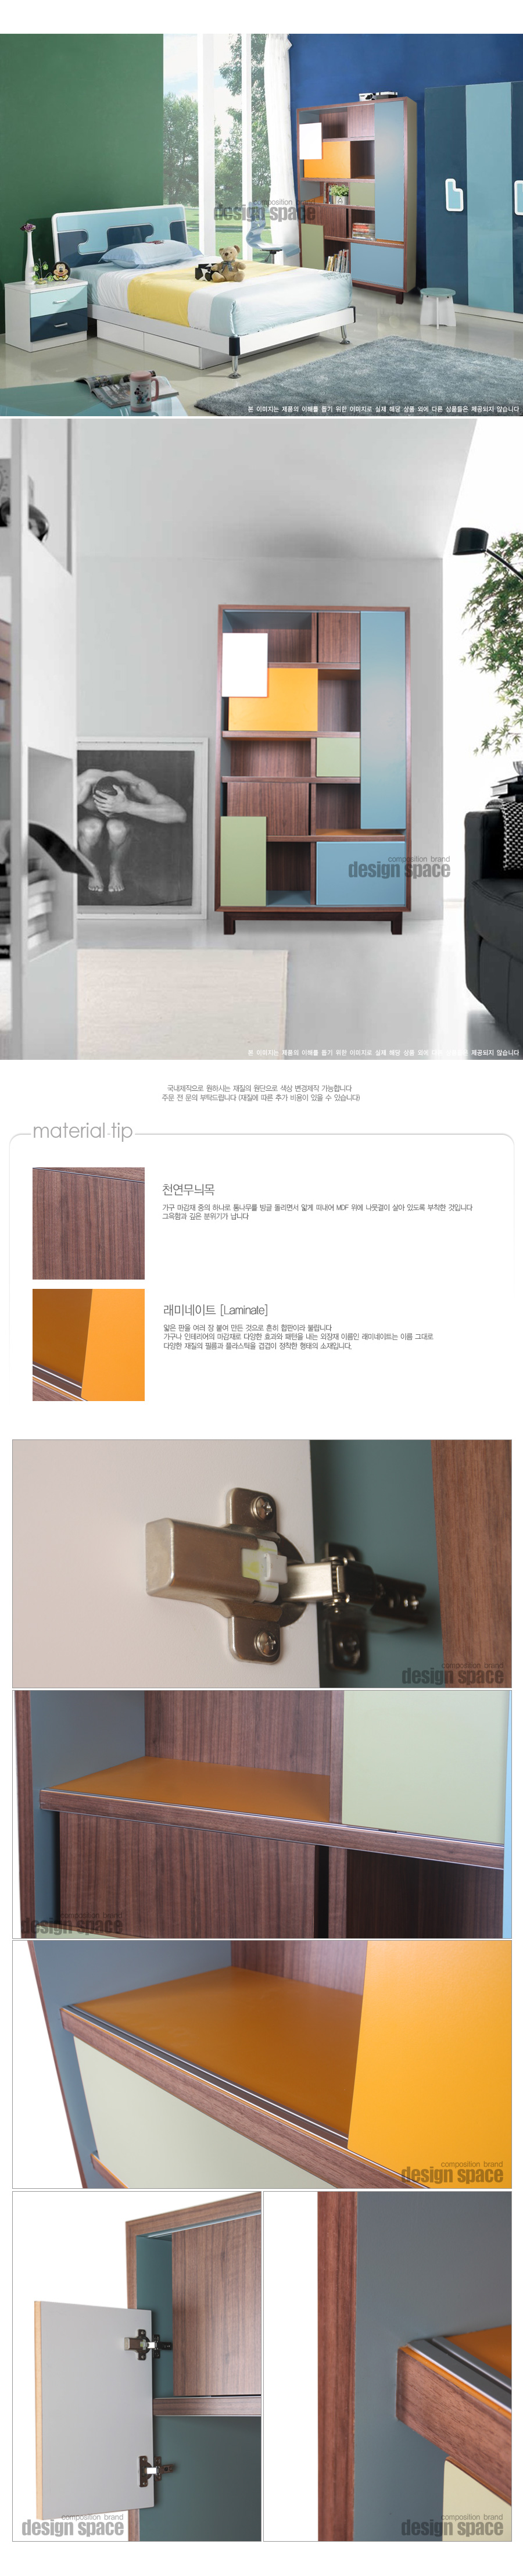 marble-bookcase_03.jpg